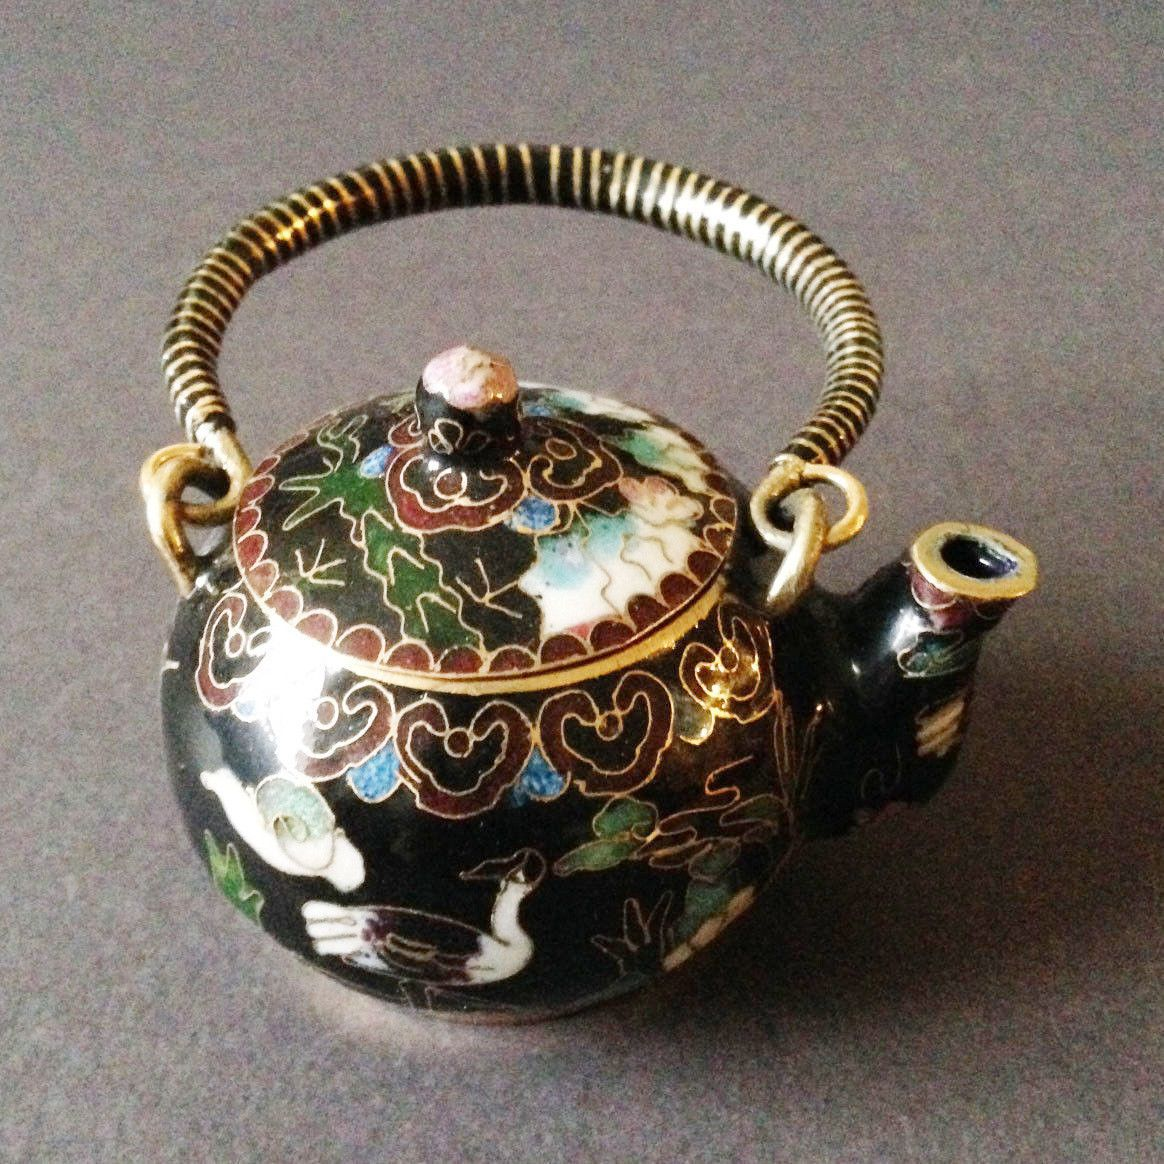 Chinese Vintage Cloisonne Tea Pot Teapot Bronze Brass Copper Enamel Handmade Blk | eBay